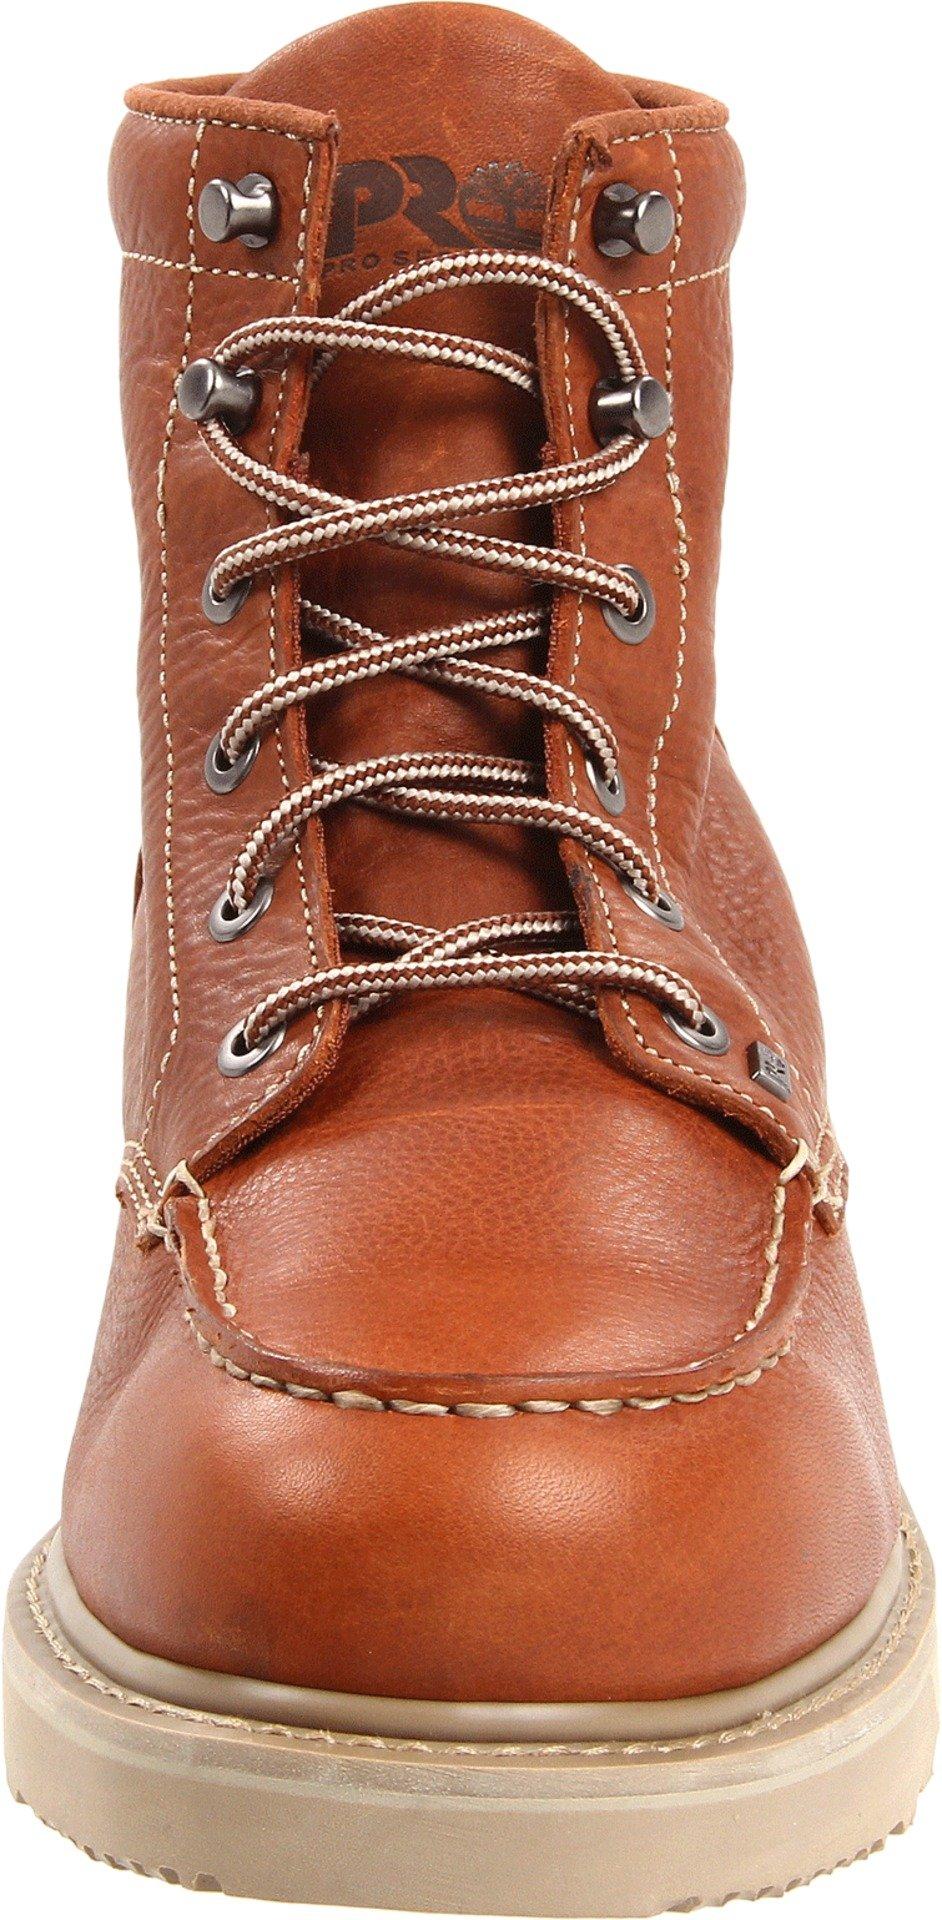 16d12c2dc7c Timberland PRO Men s Barstow Wedge Work Boot